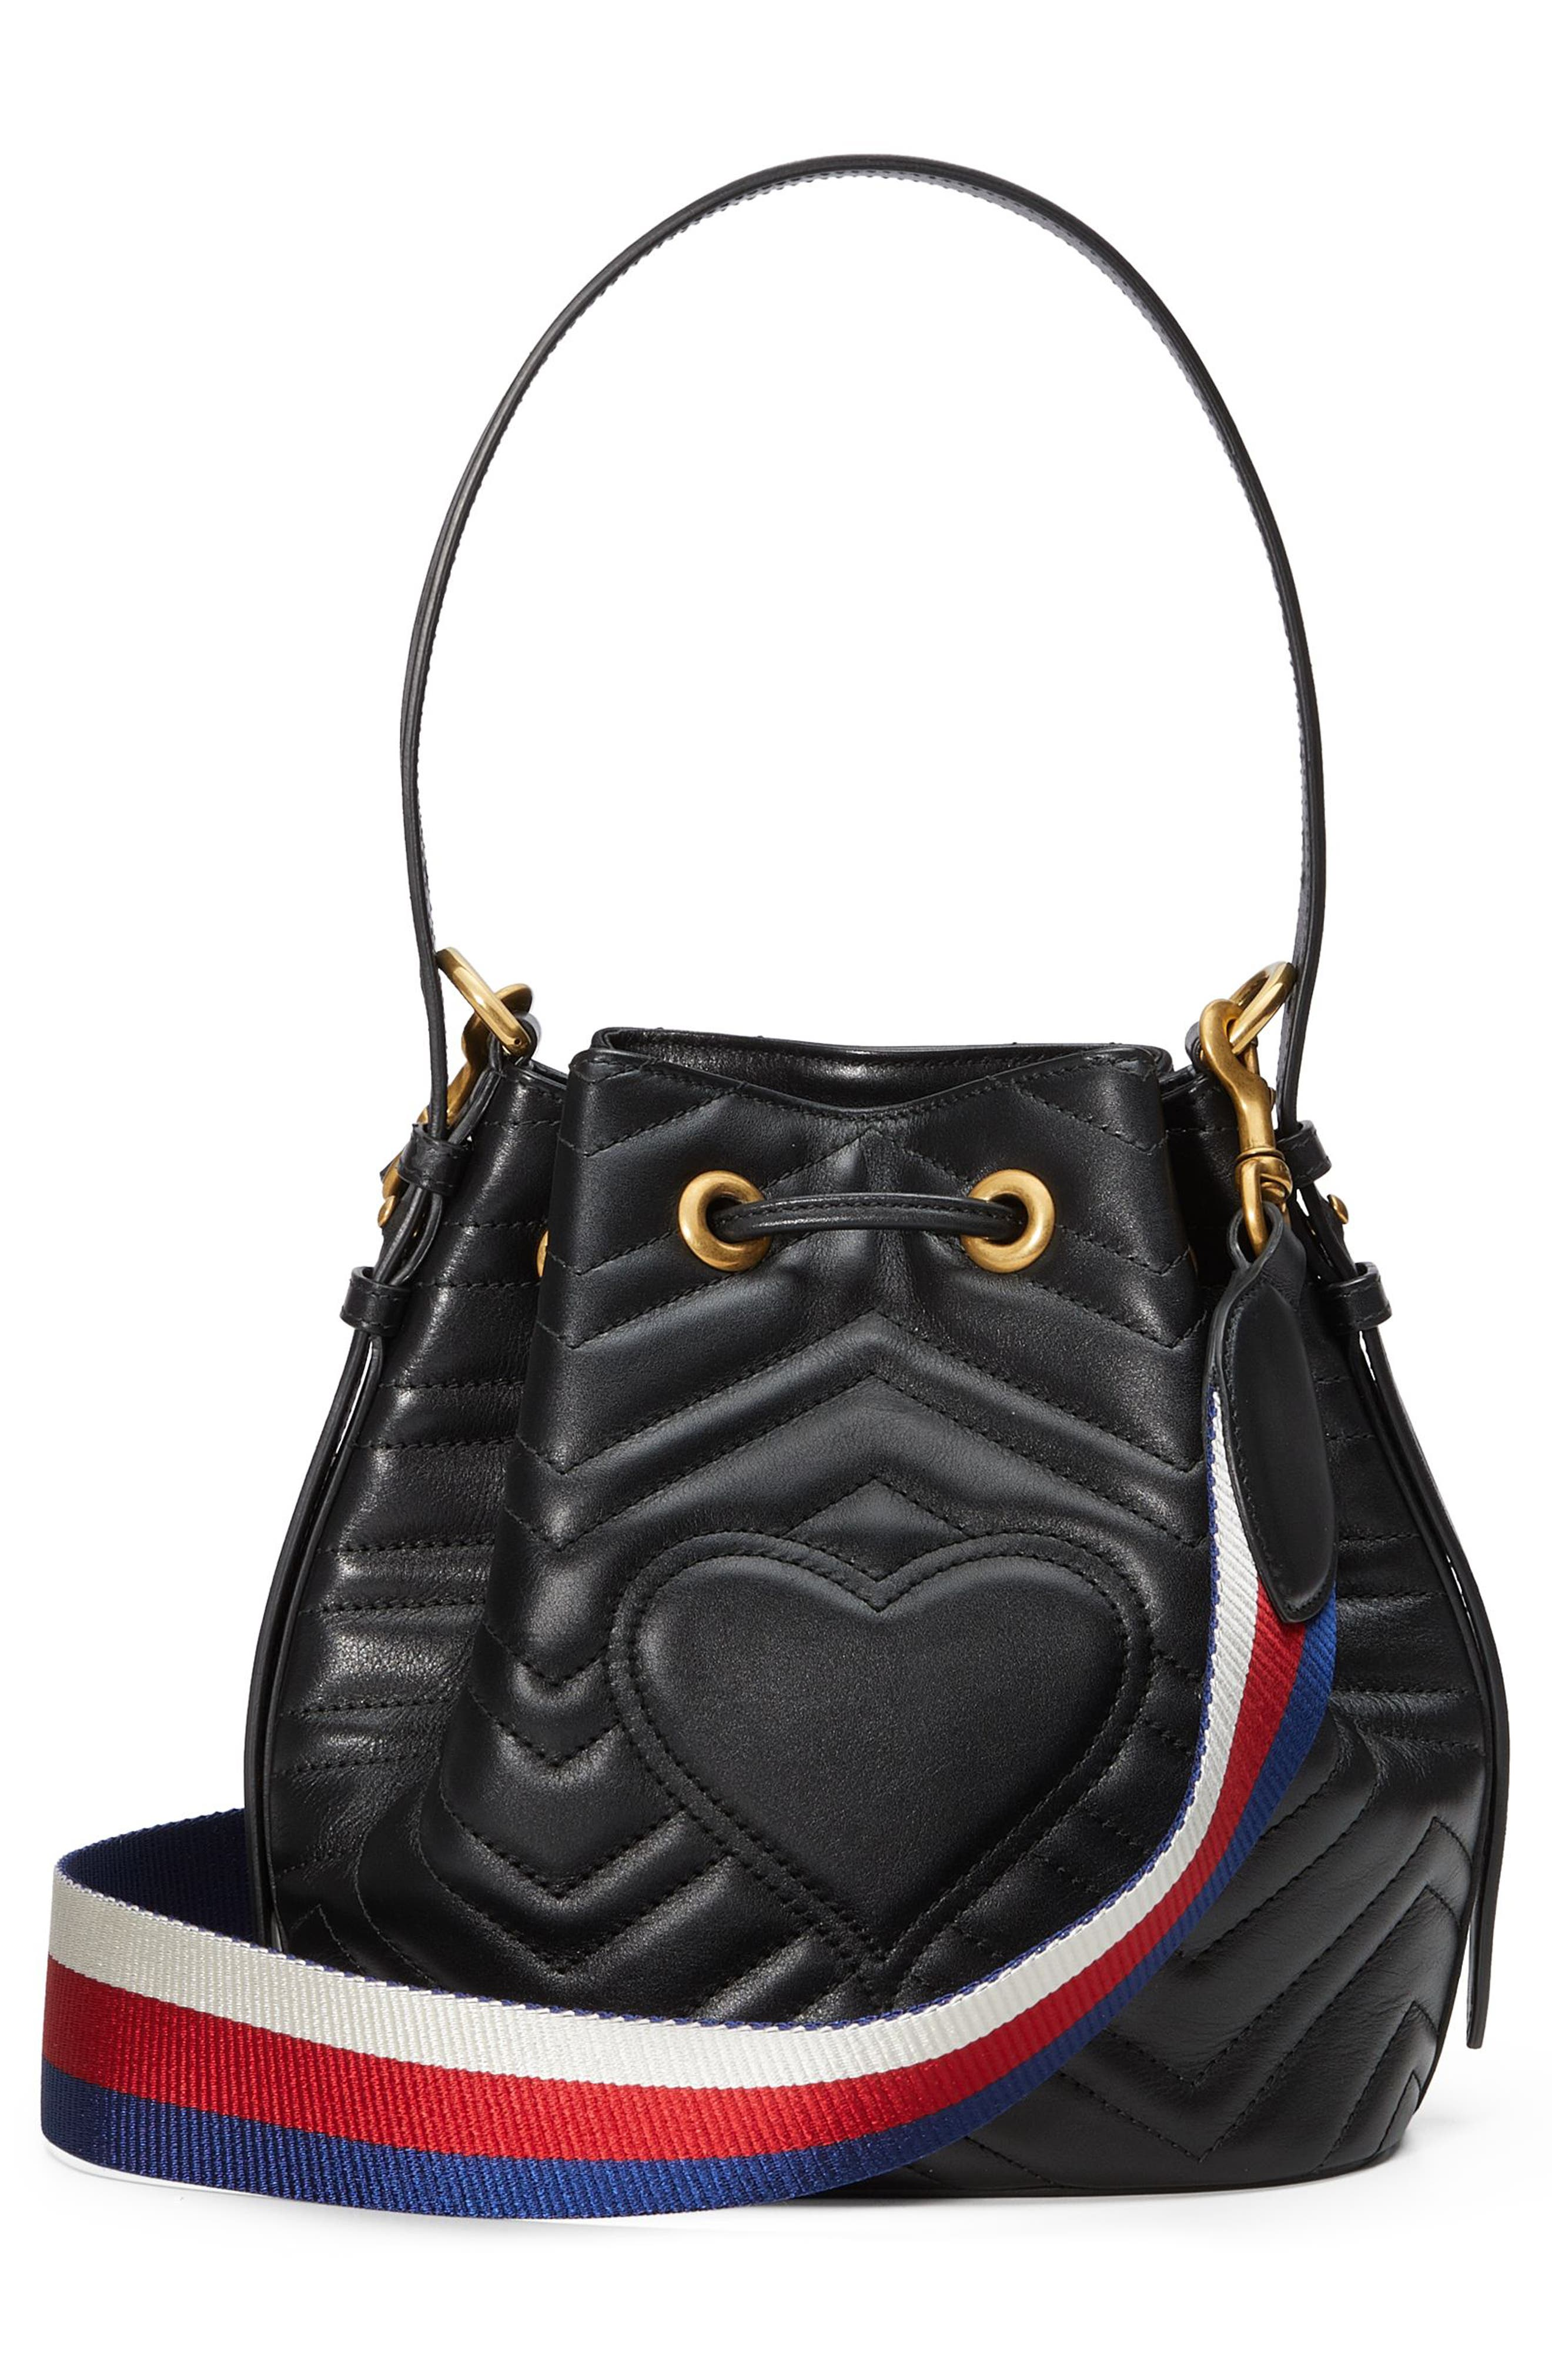 GG Marmont 2.0 Matelassé Leather Bucket Bag,                             Alternate thumbnail 2, color,                             Nero